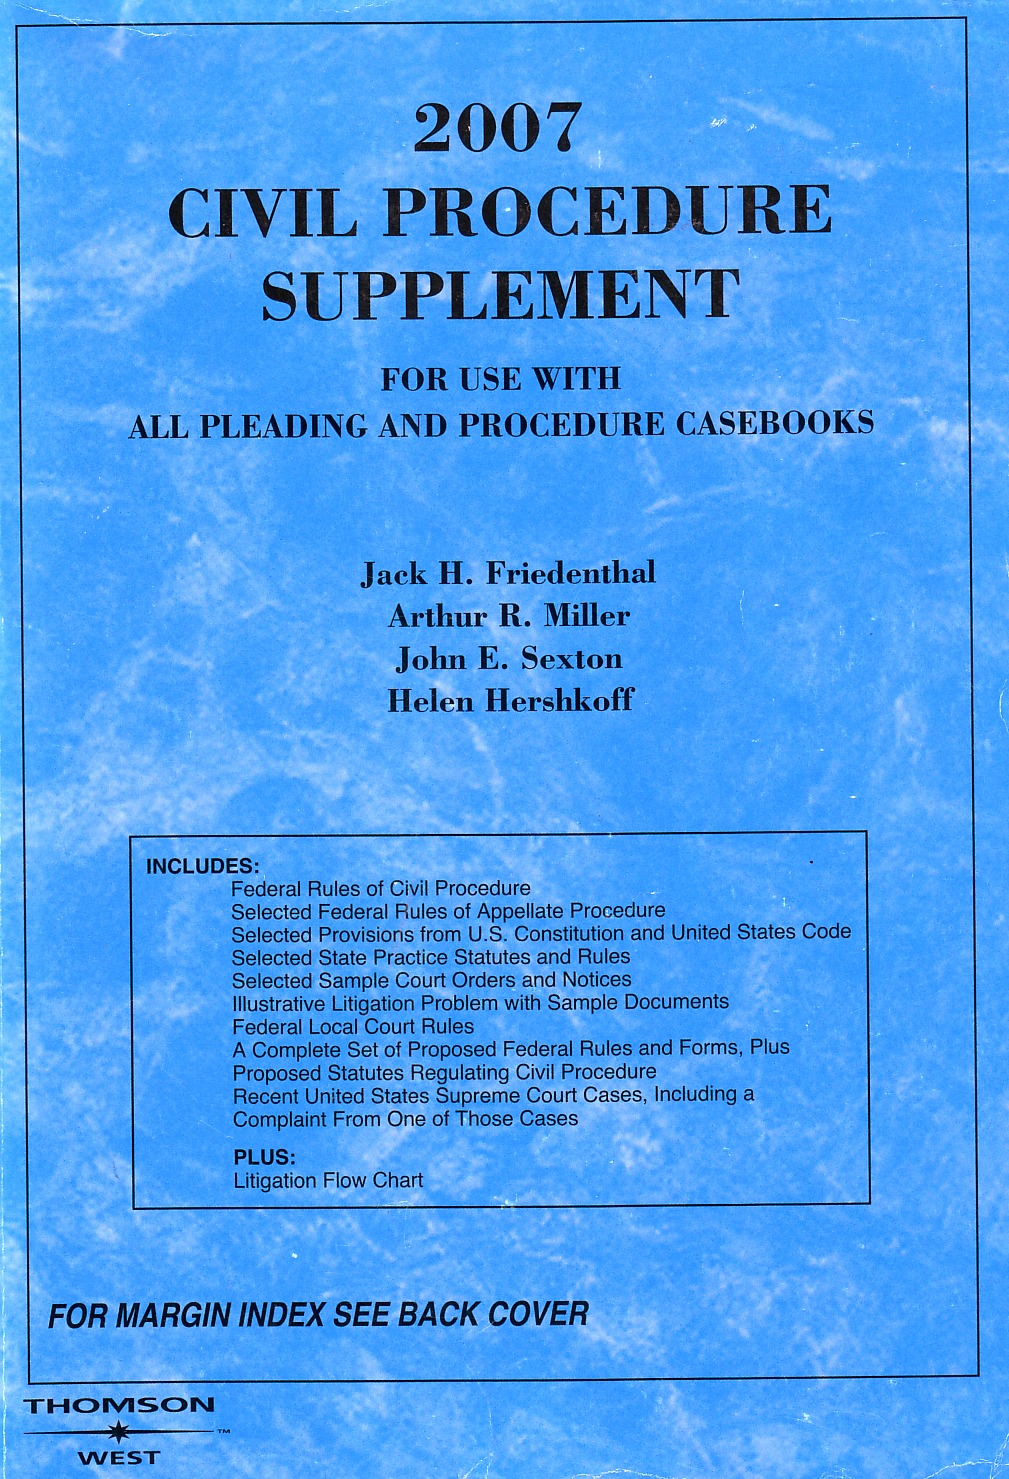 2007 Civil Procedure...